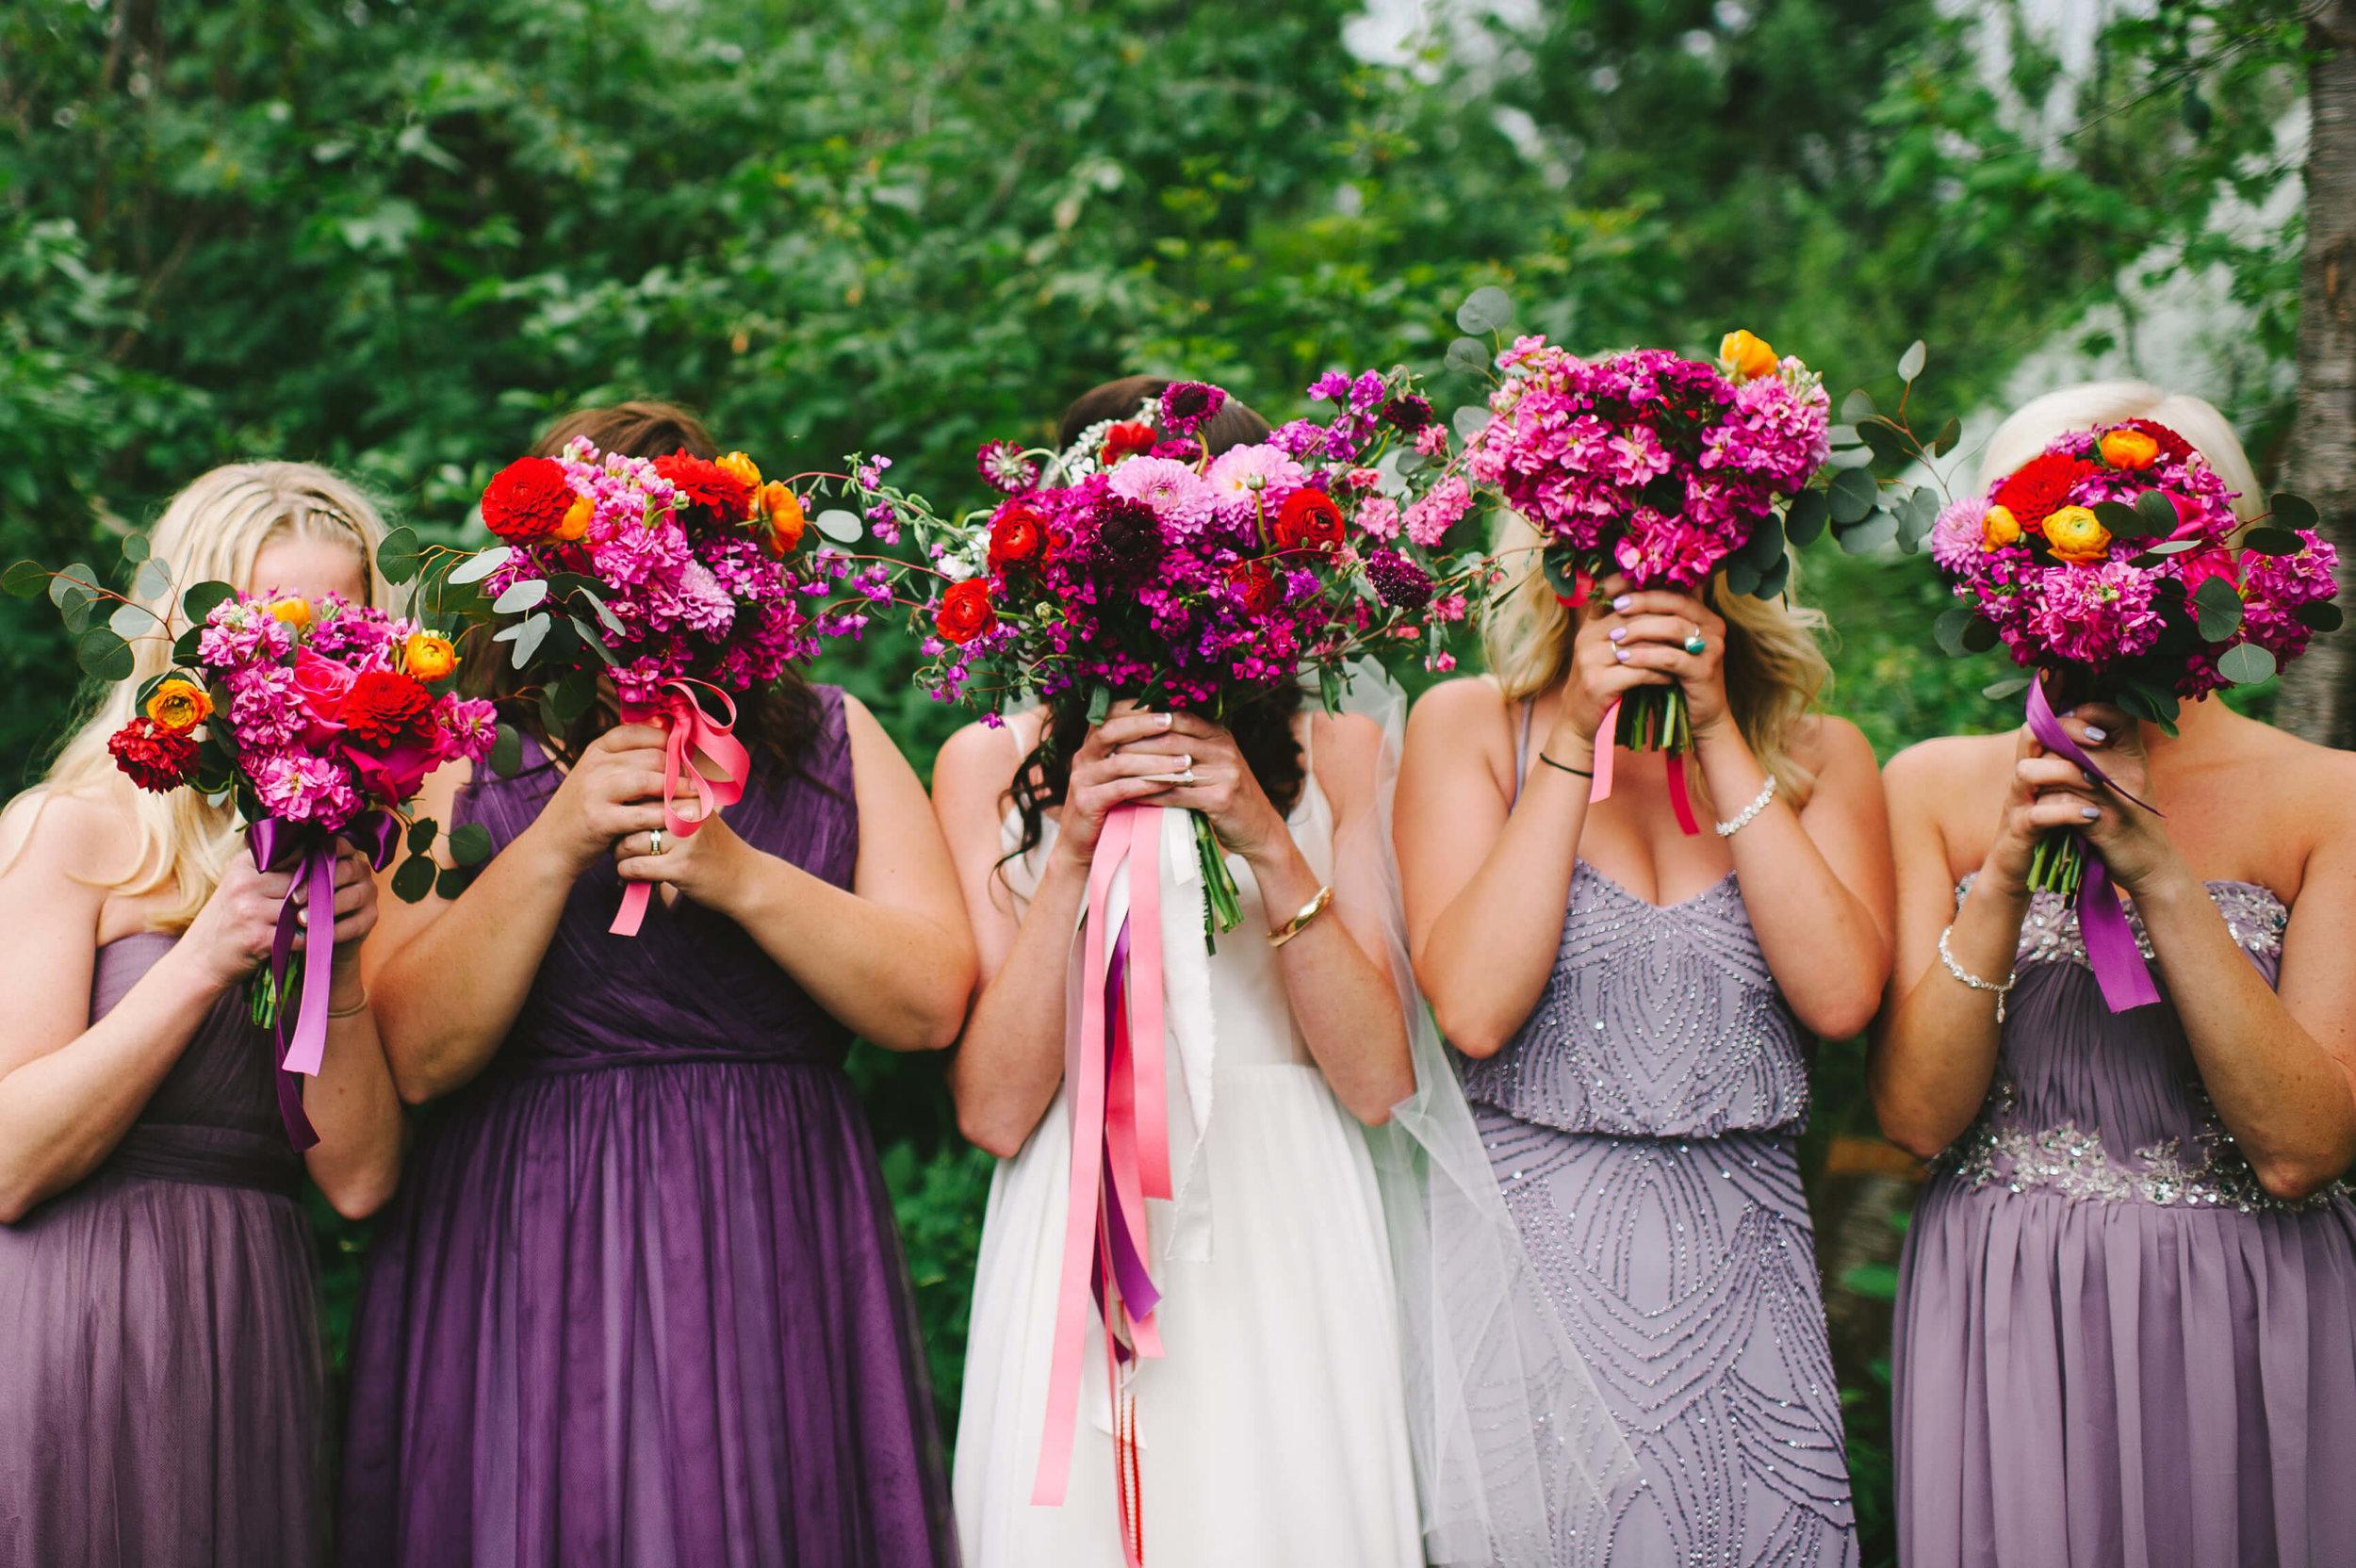 engle-olson-fran-ze-photo-montana-wedding-22.jpg